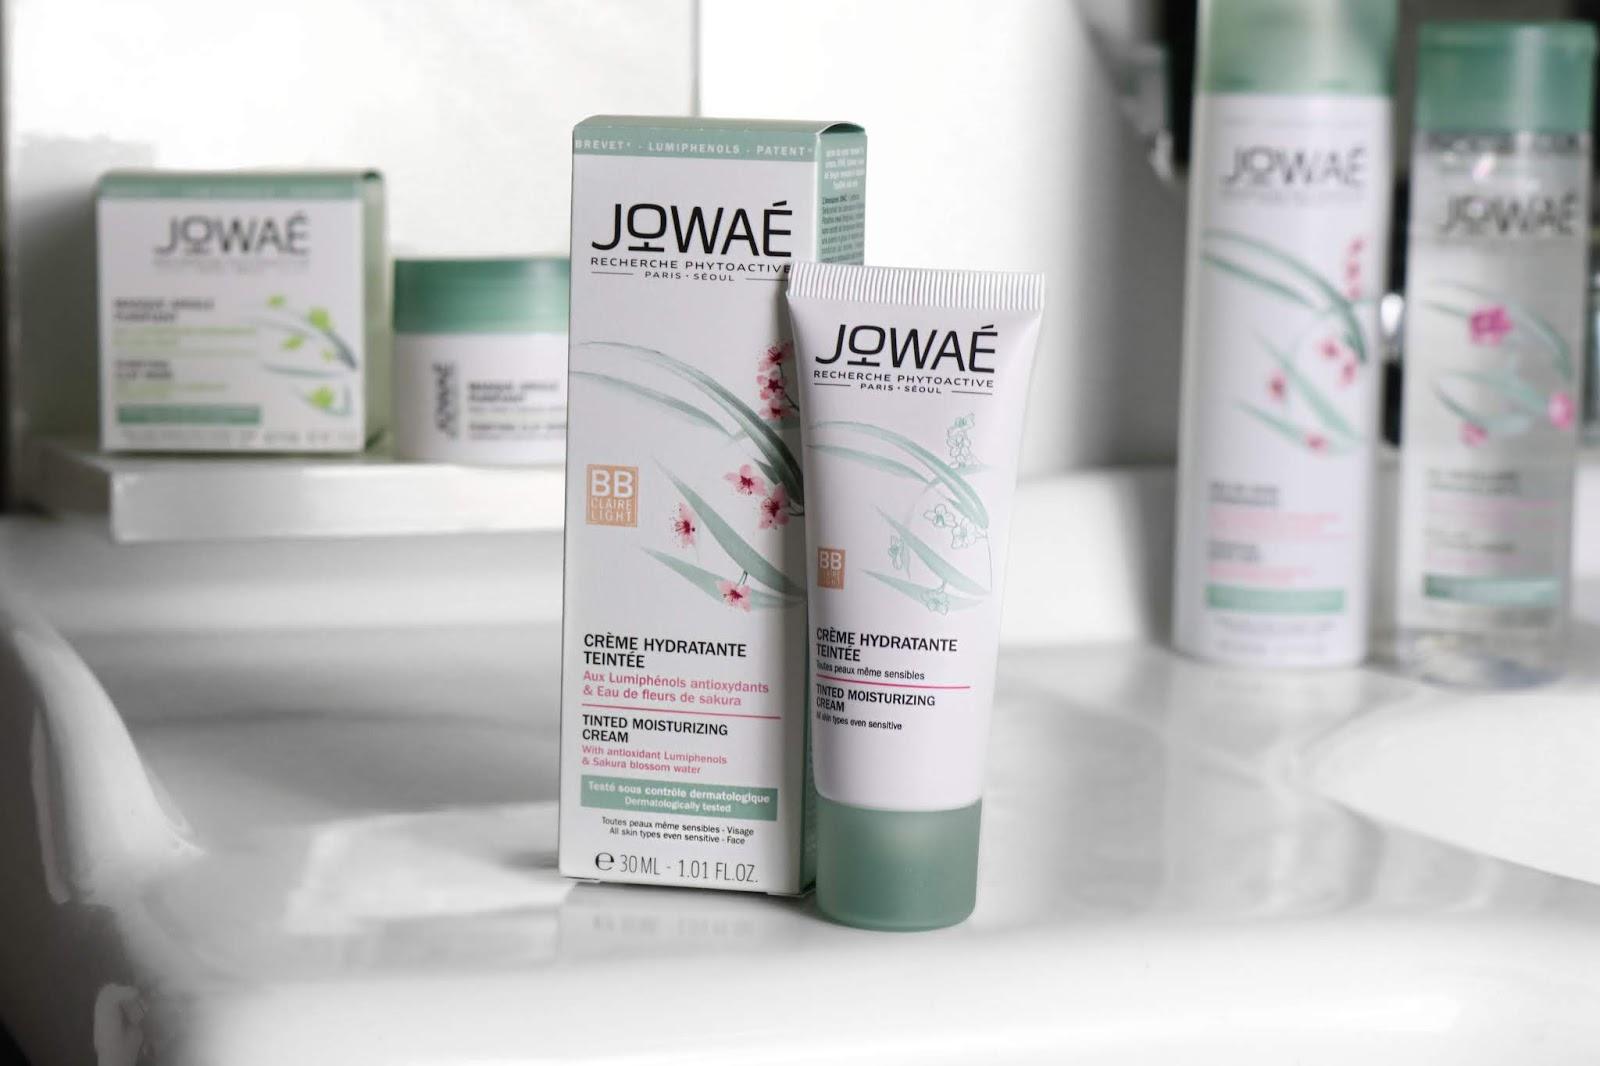 tinted moisturizing cream jowae